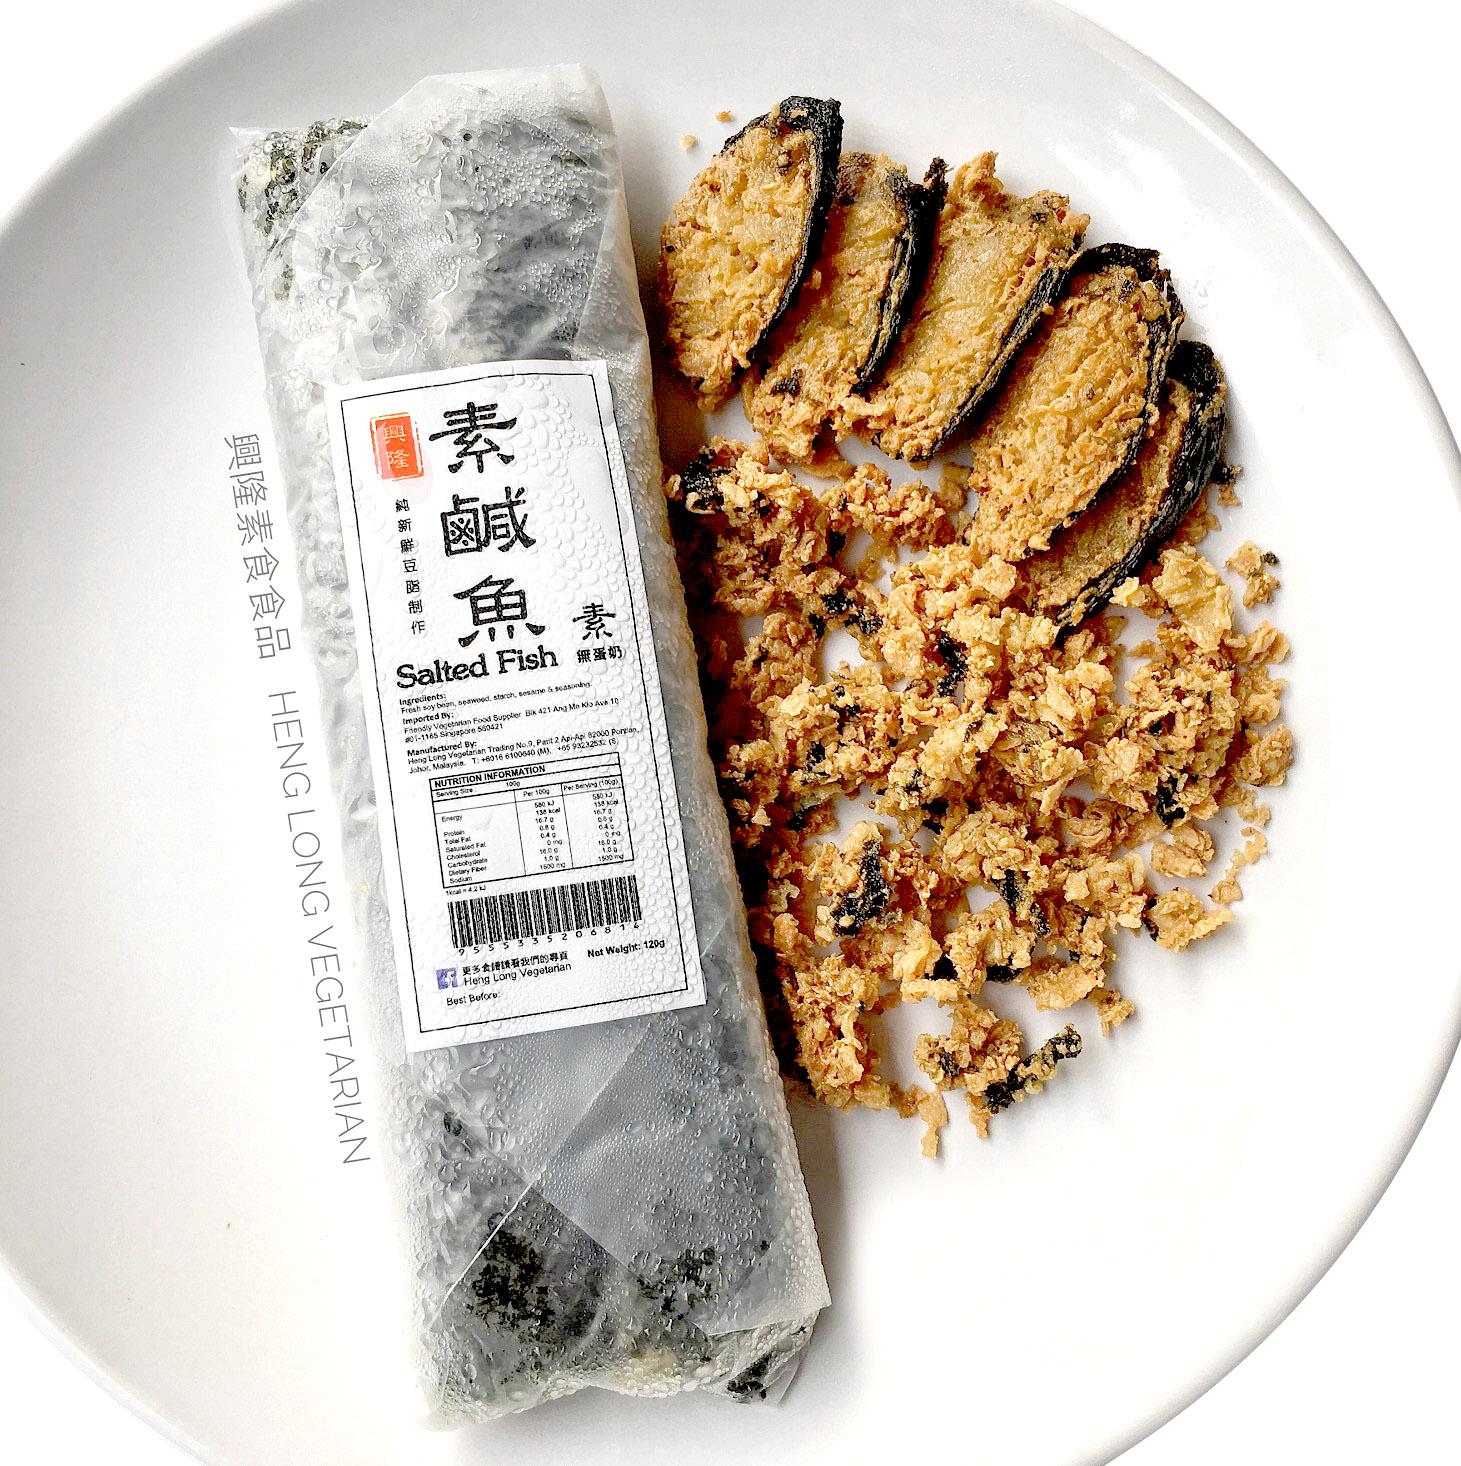 Image Heng Long Salted Fish 兴隆 - 素咸鱼 120grams